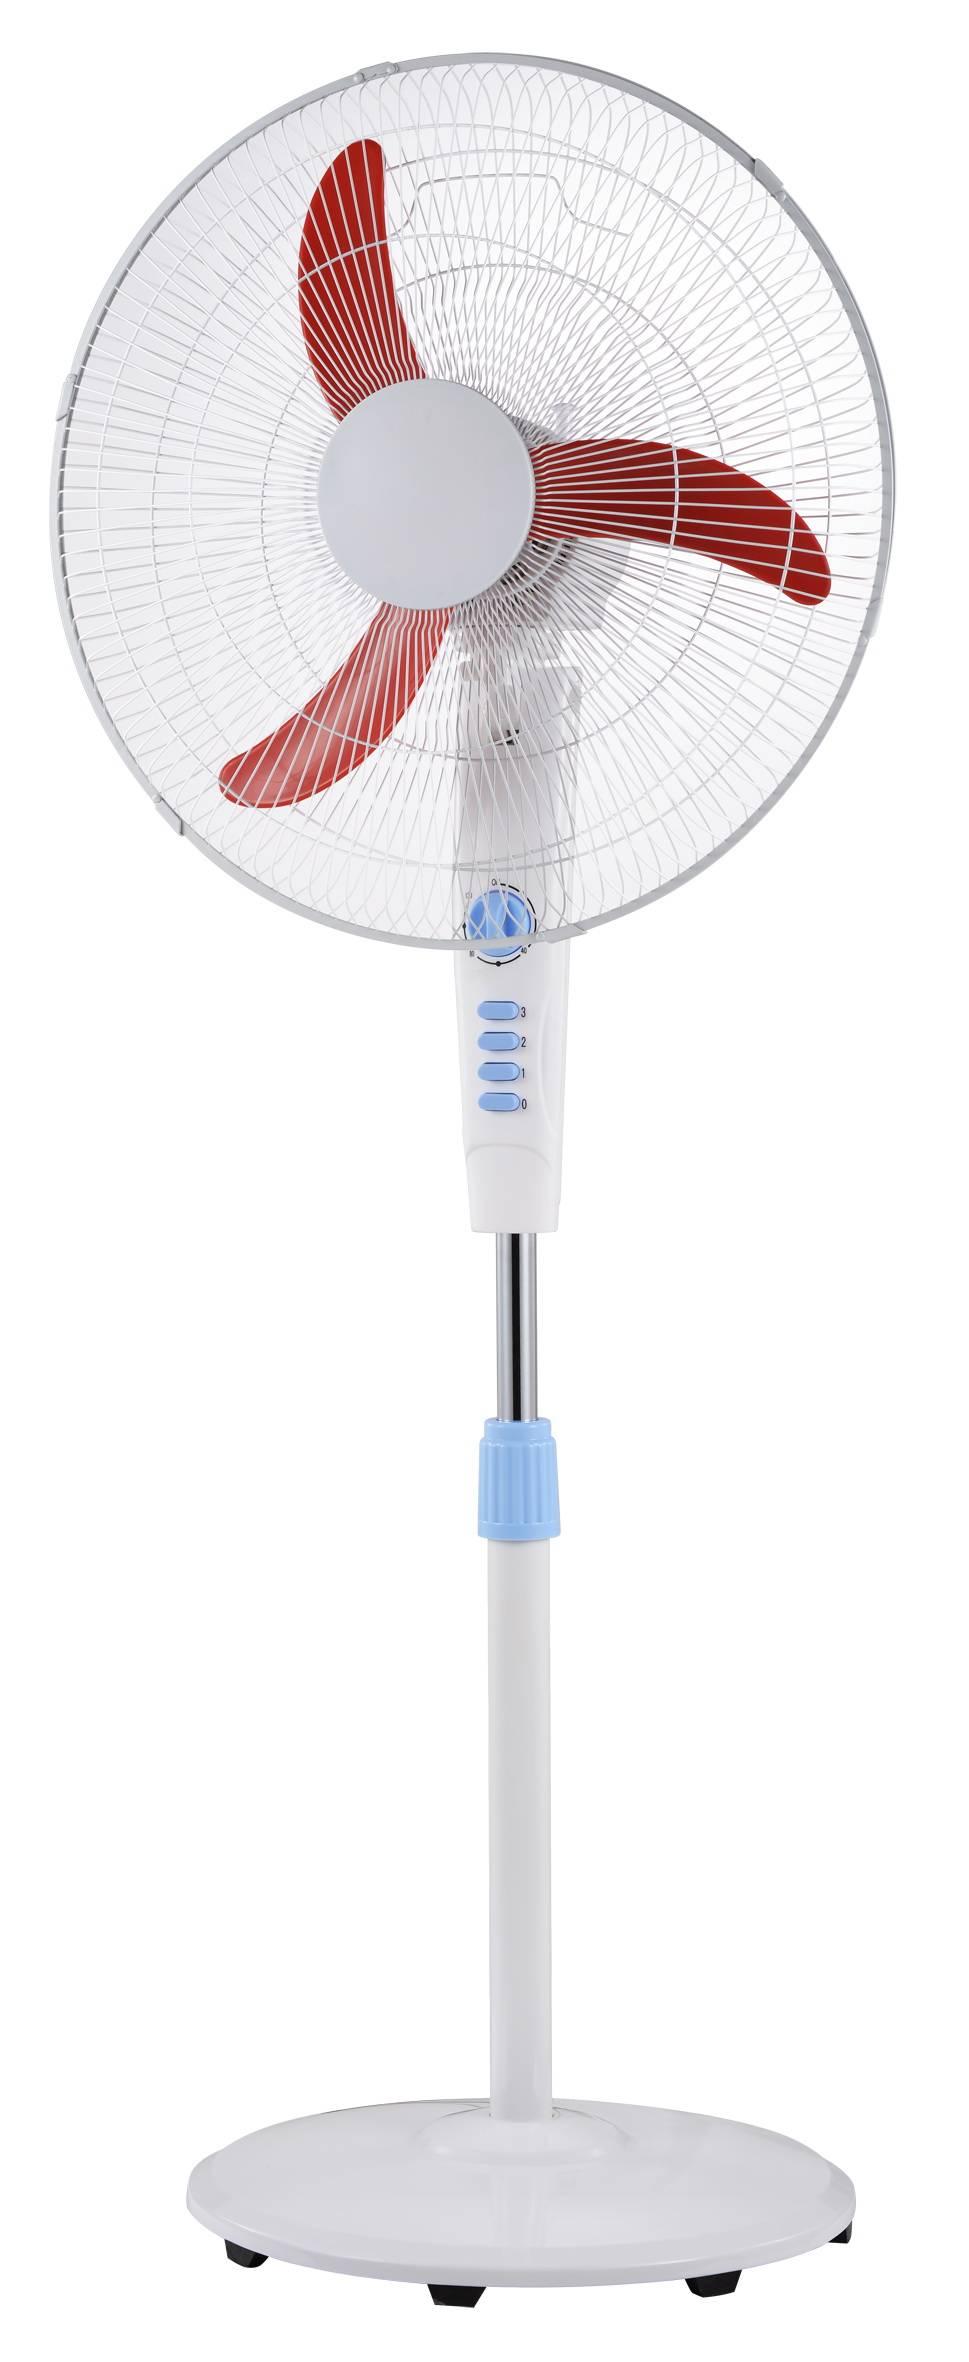 18 inch AC motor stand fan,FS45-14DB